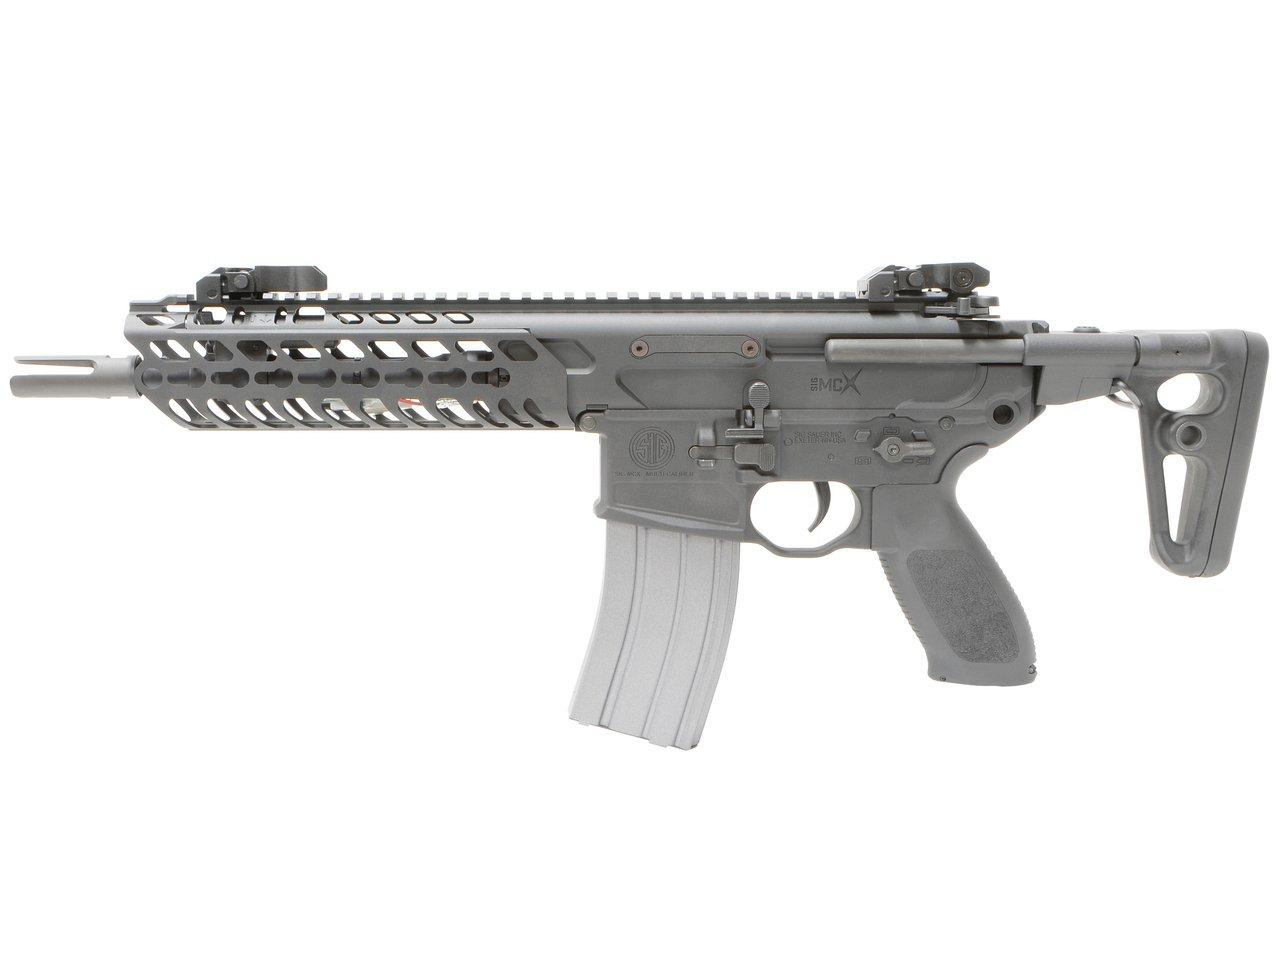 CYB-AEG-280937